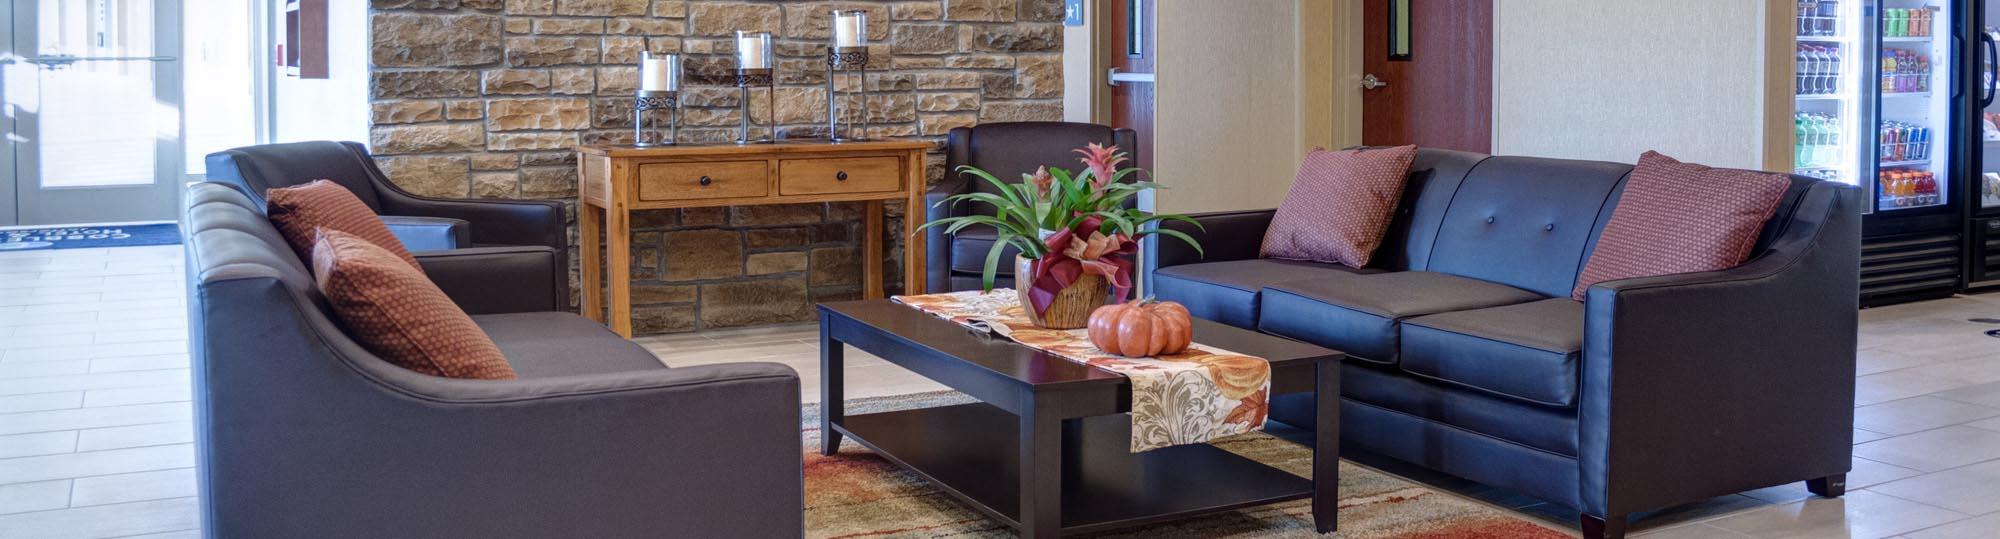 Cobblestone Hotel & Suites Main Street Jefferson